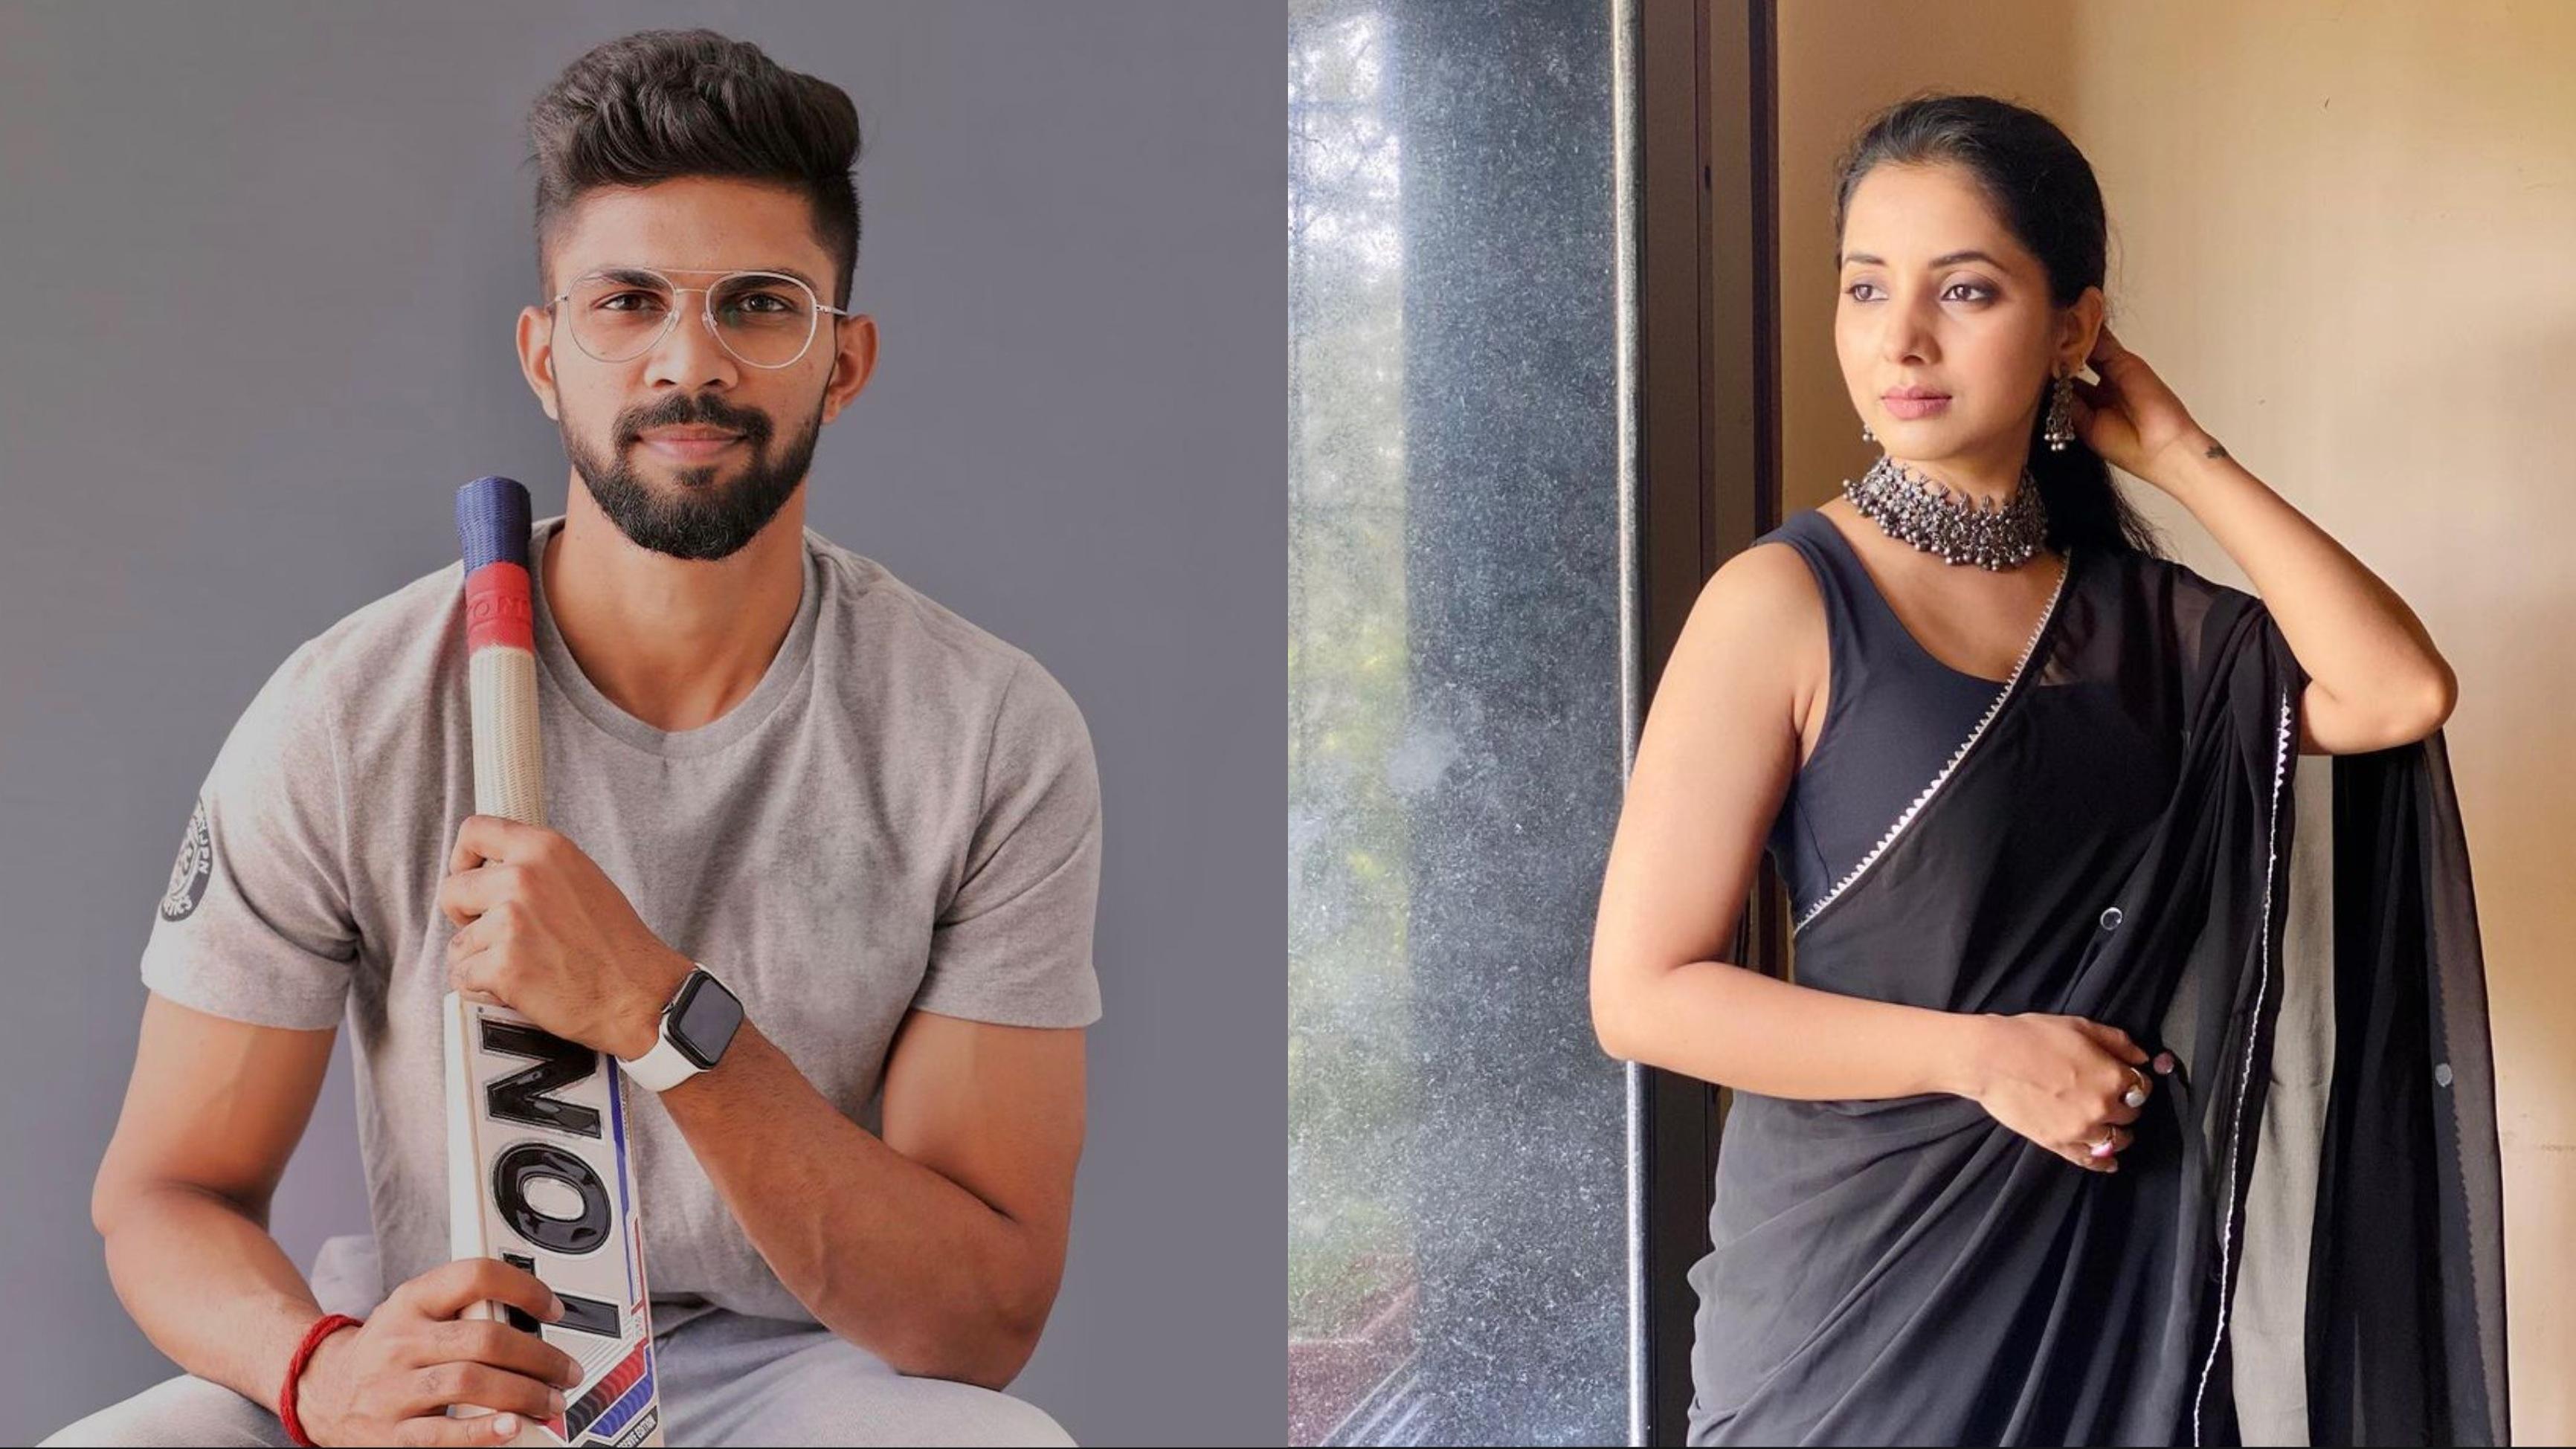 Ruturaj Gaikwad silences rumors of his relationship with Sayali Sanjeev